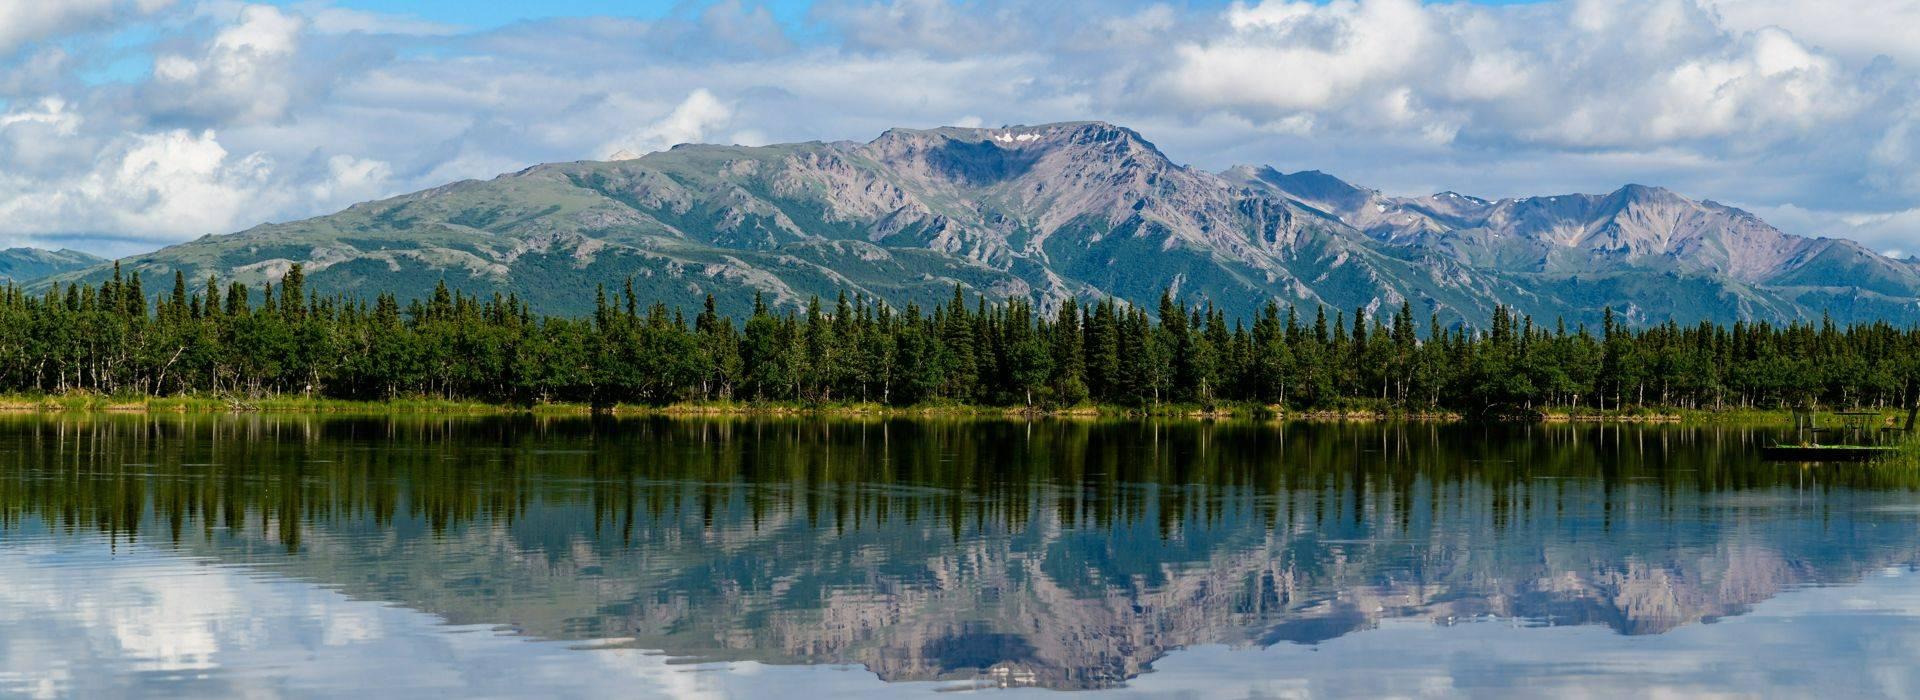 Alaska Wellness Vacations